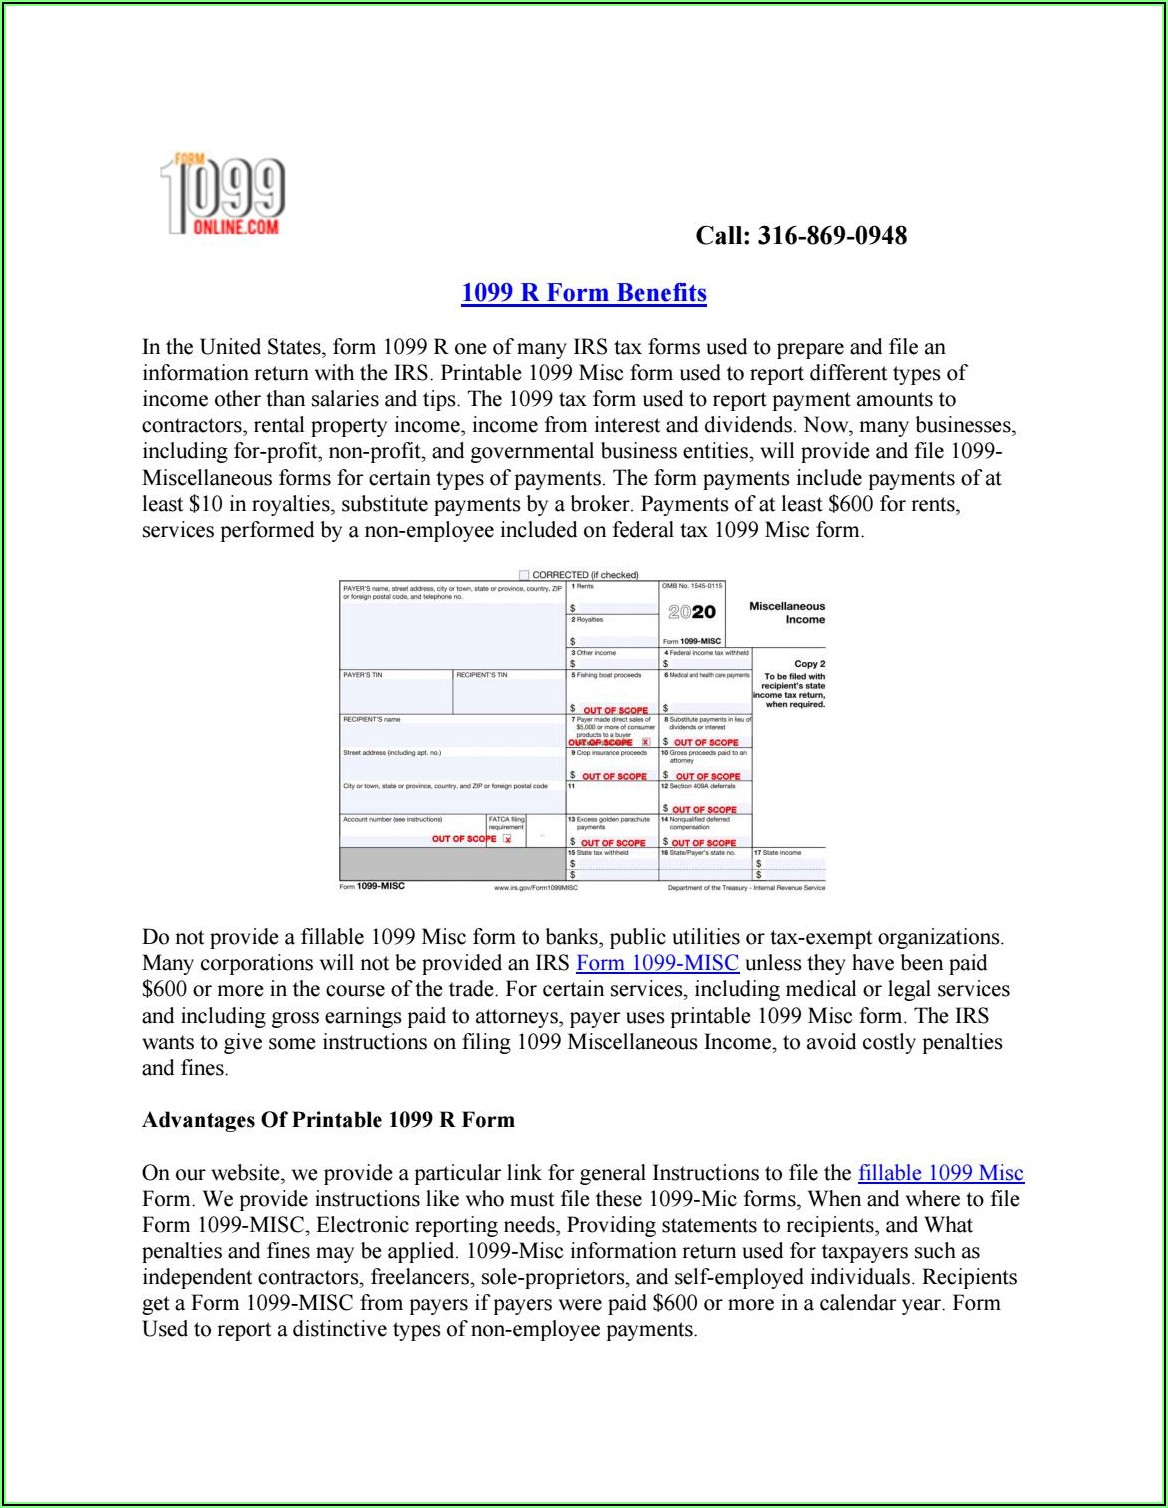 Printable 1099 R Form 2020